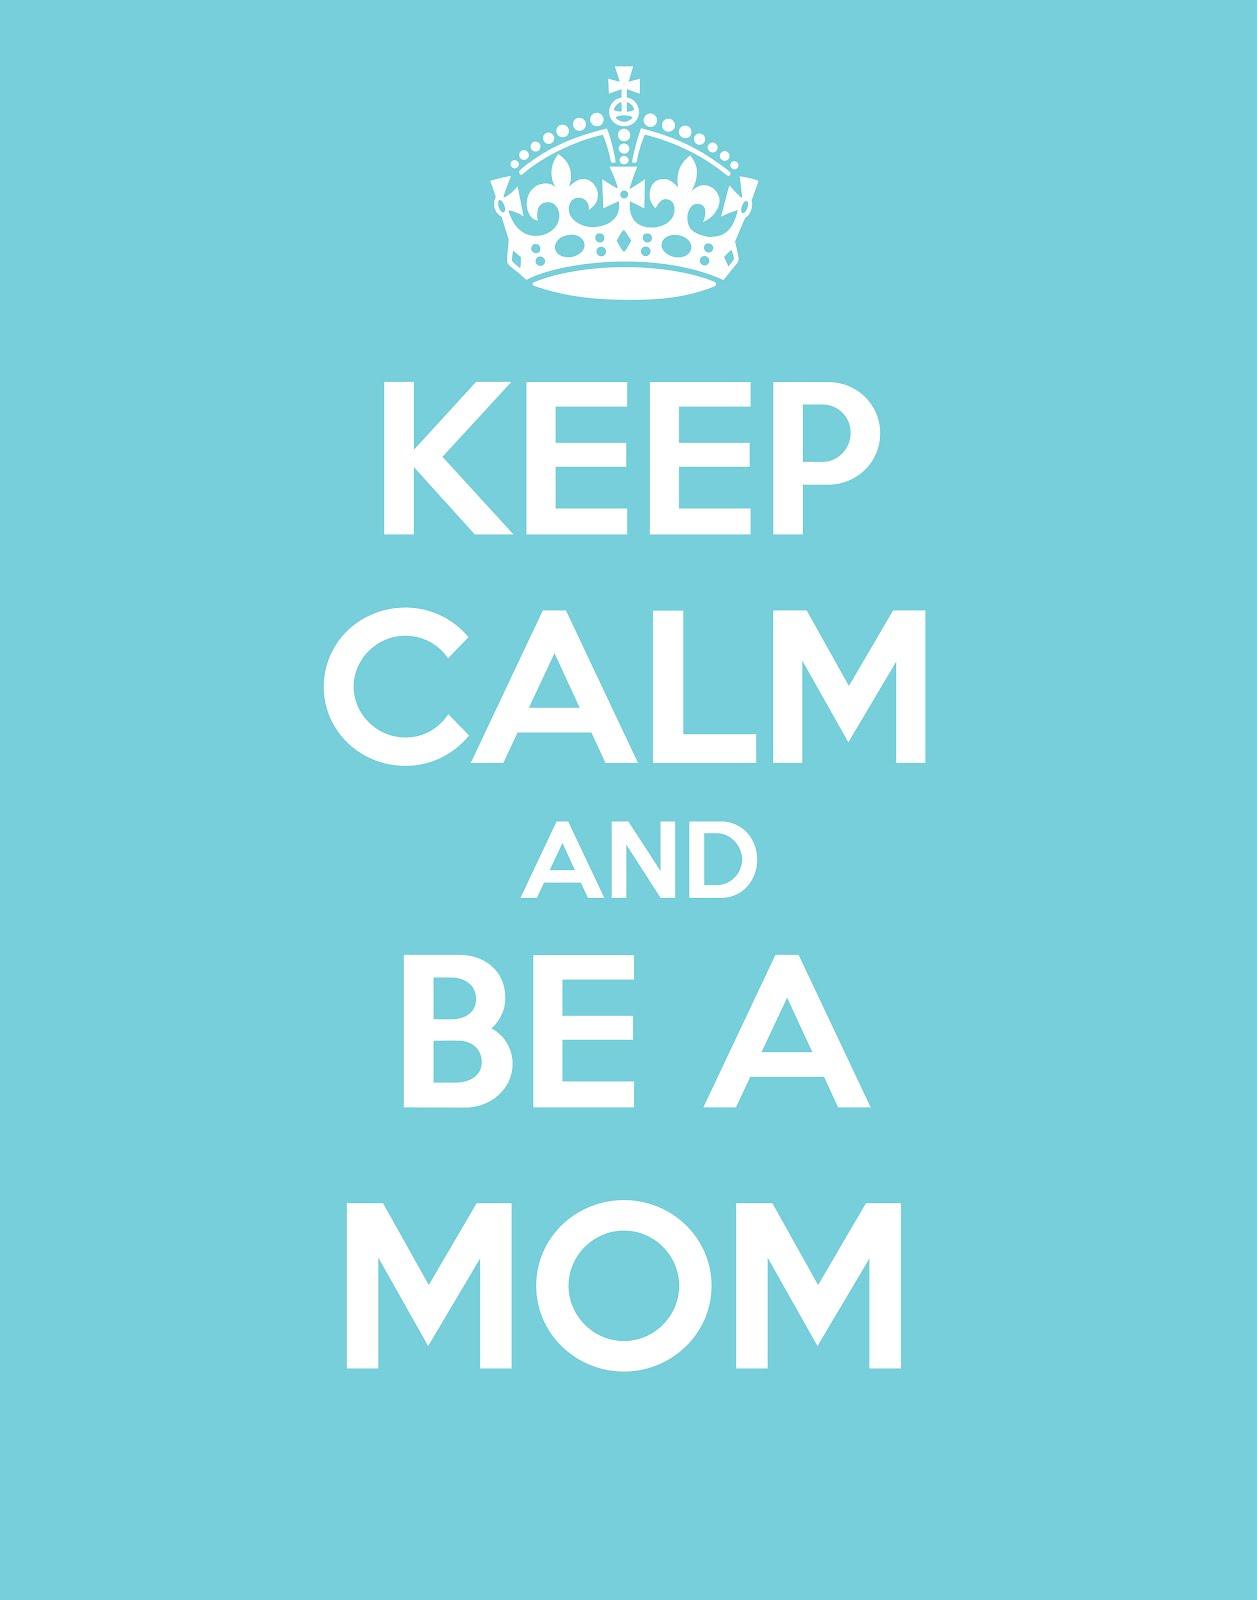 keep-calm-and-be-a-mom.jpg